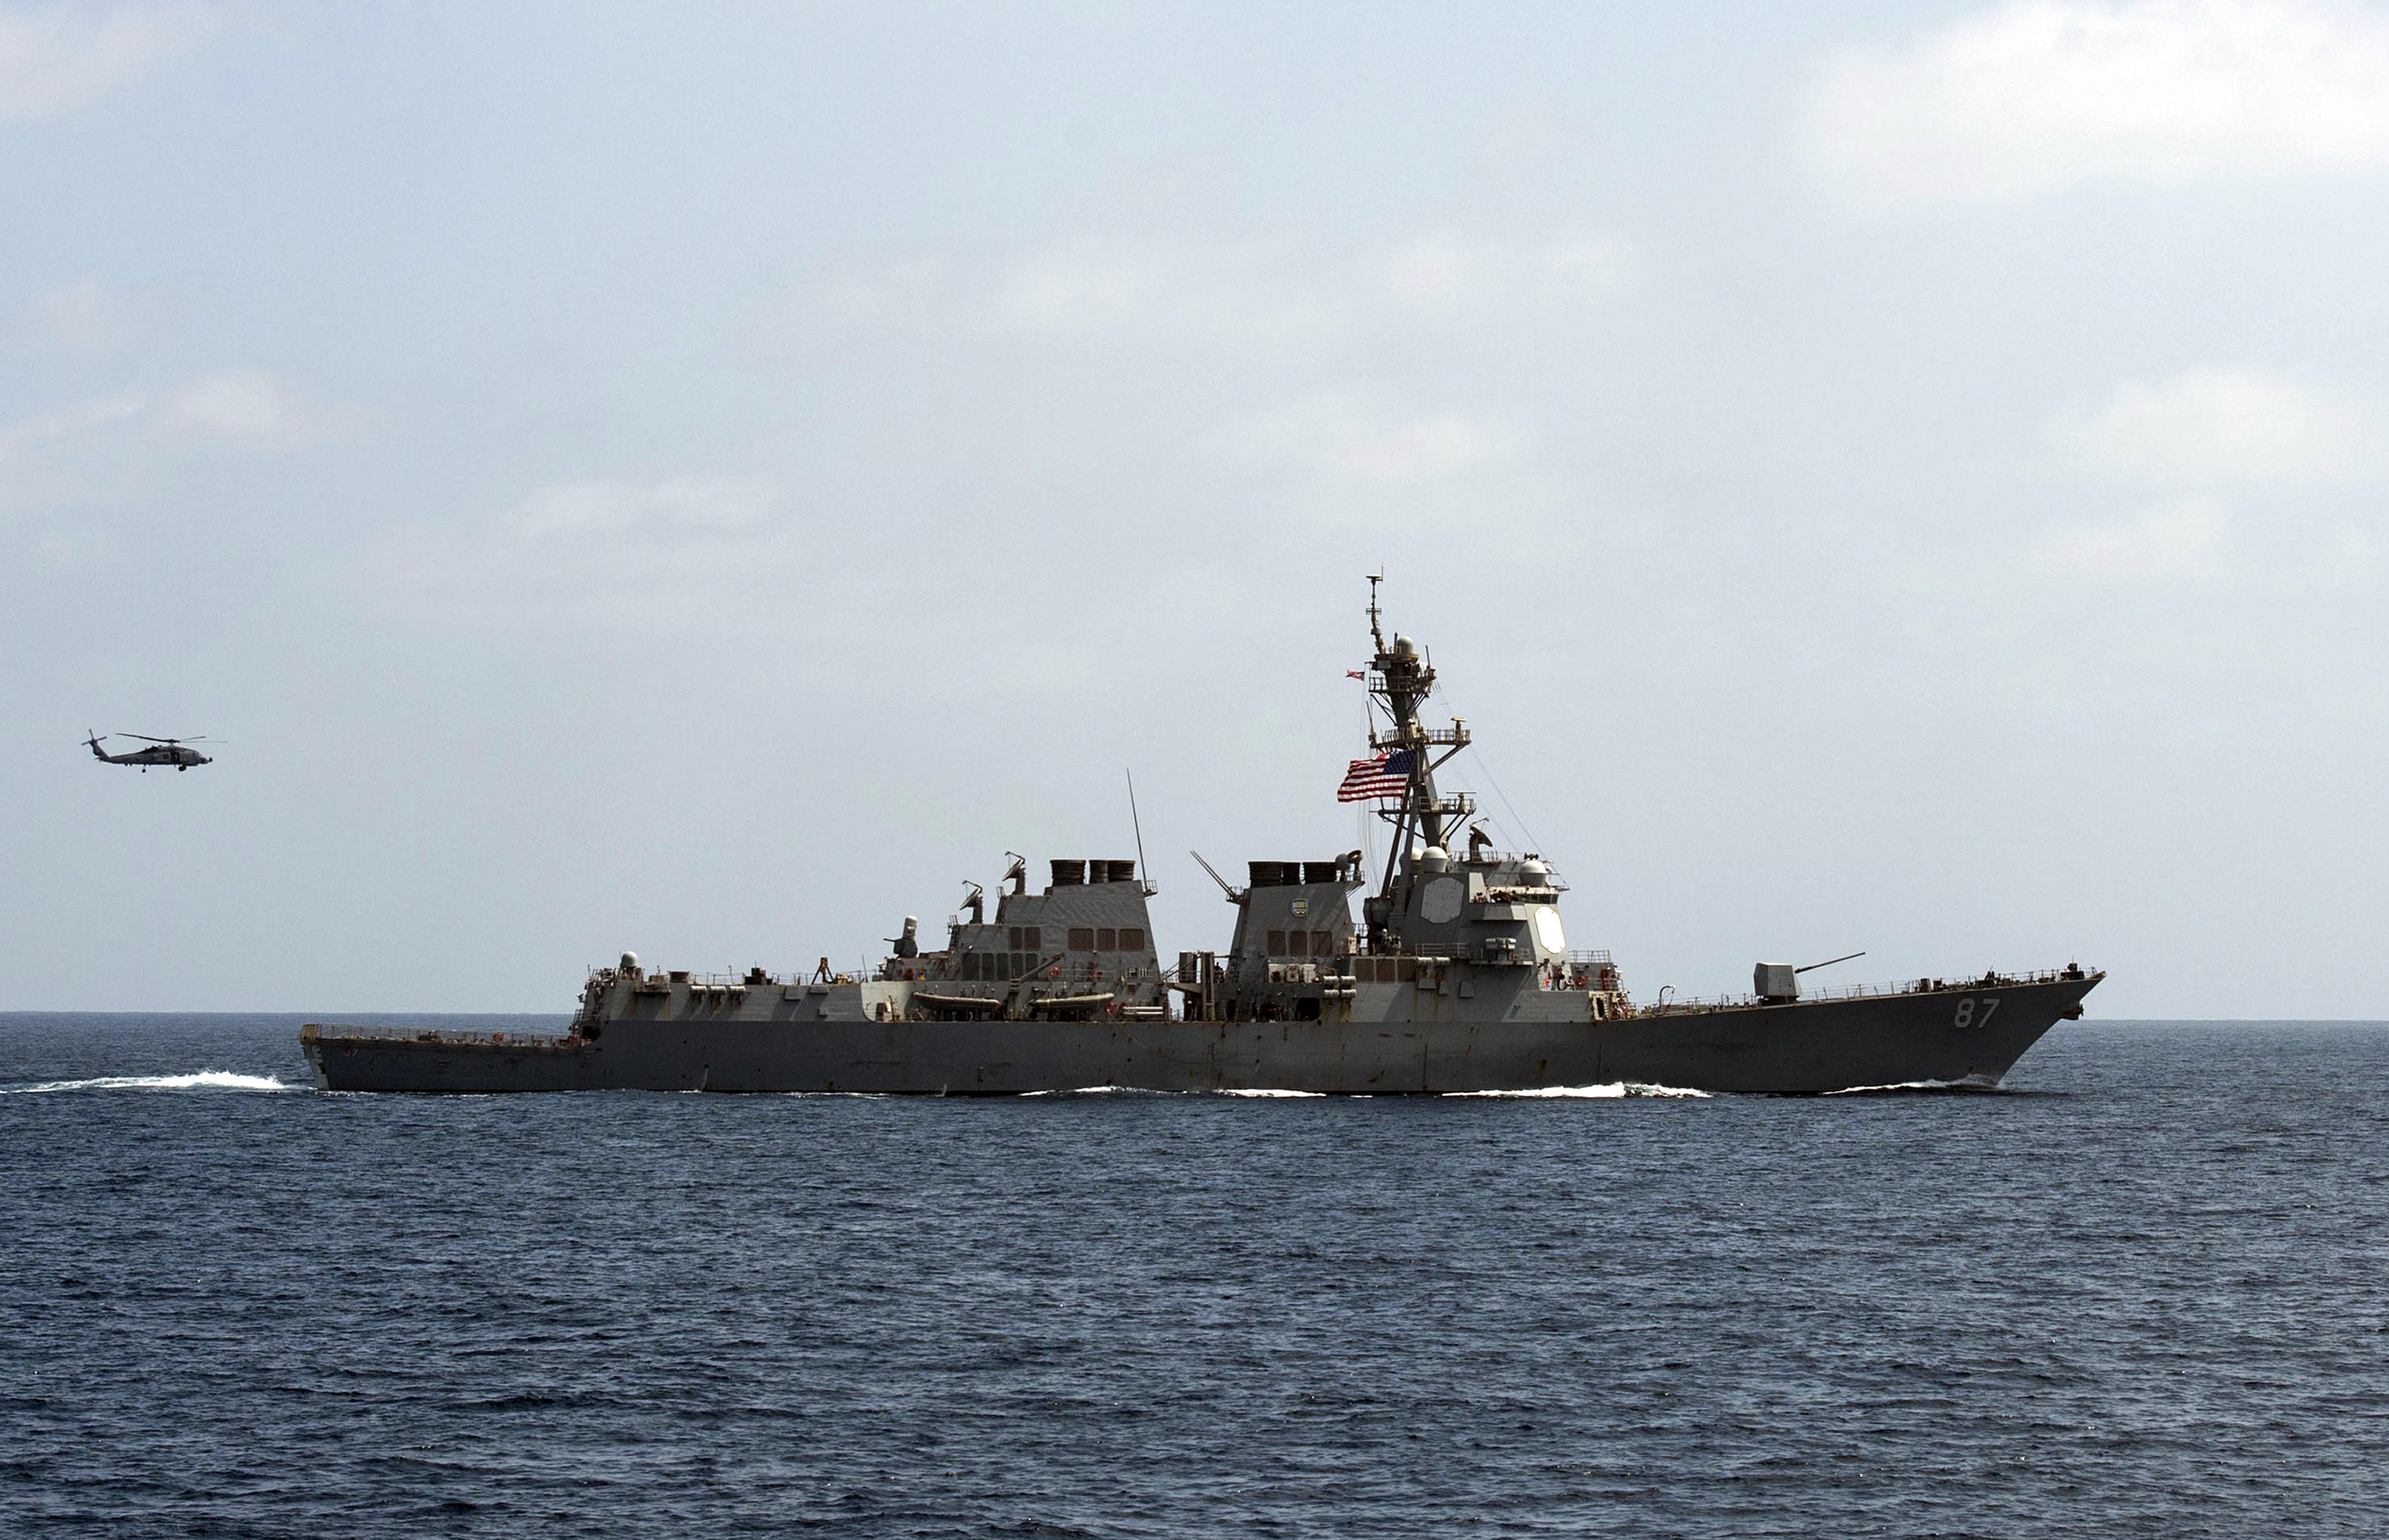 U.S. Official: Navy Fires At Radar Sites In Yemen After Navy Destroyer Was Targeted